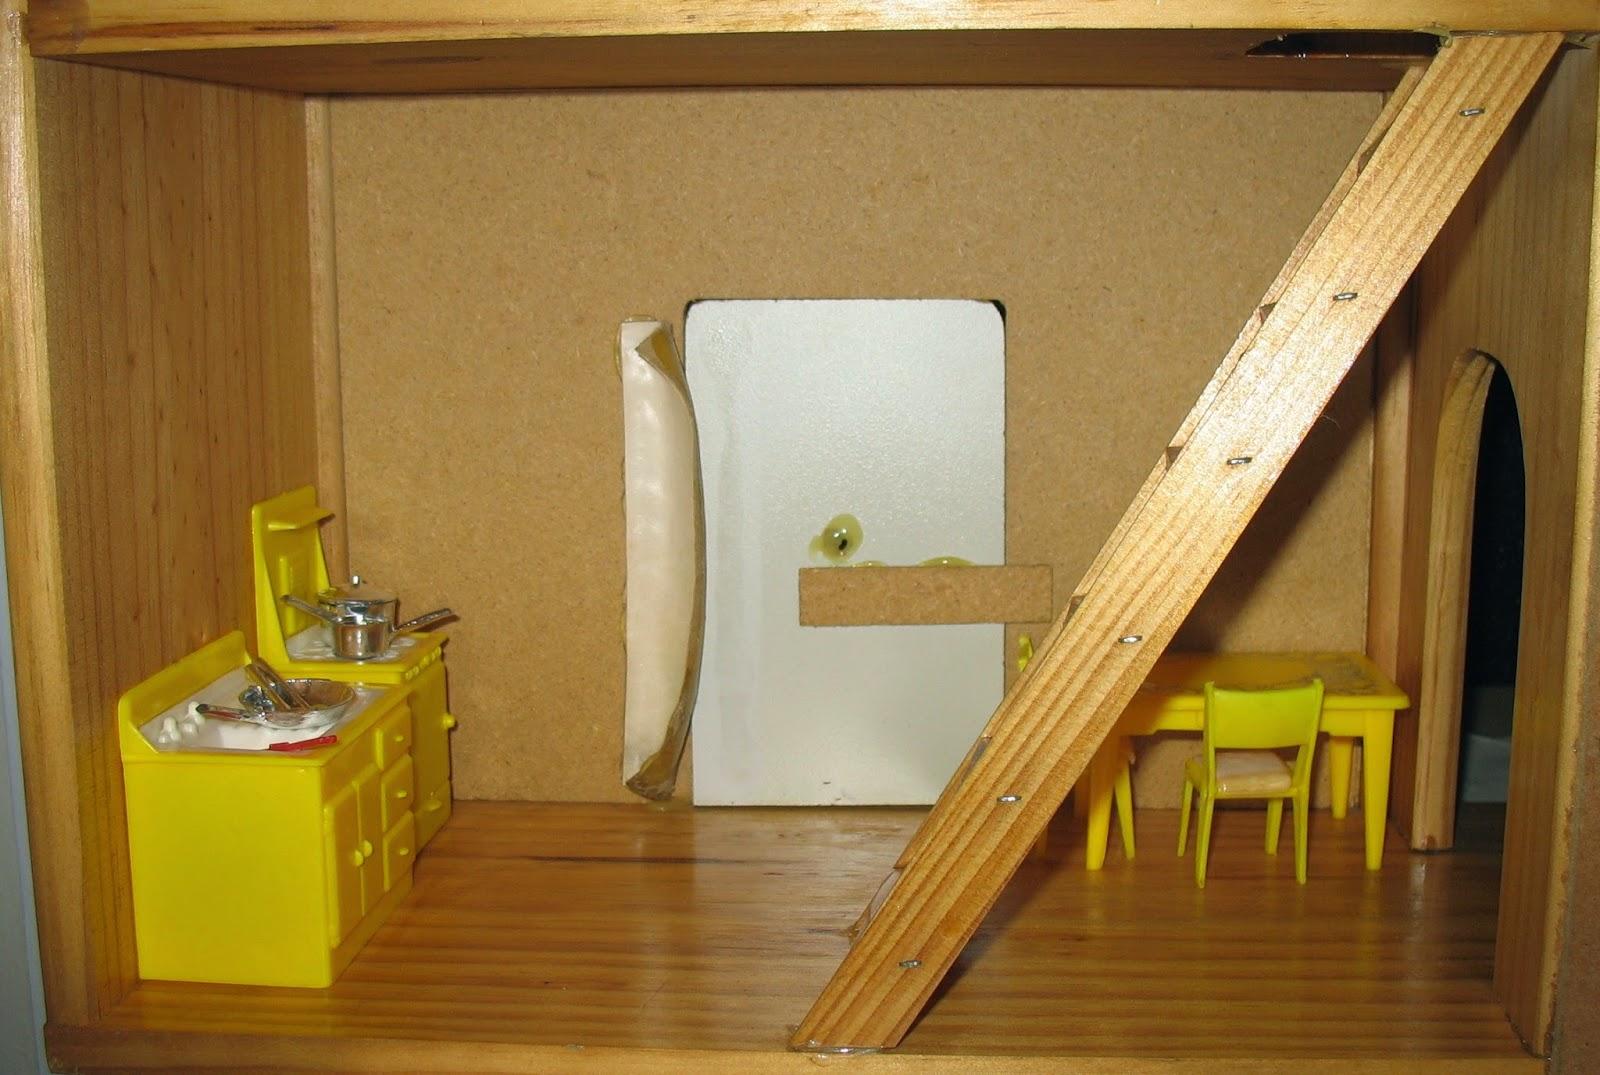 yellow door shutters house yellow plastic